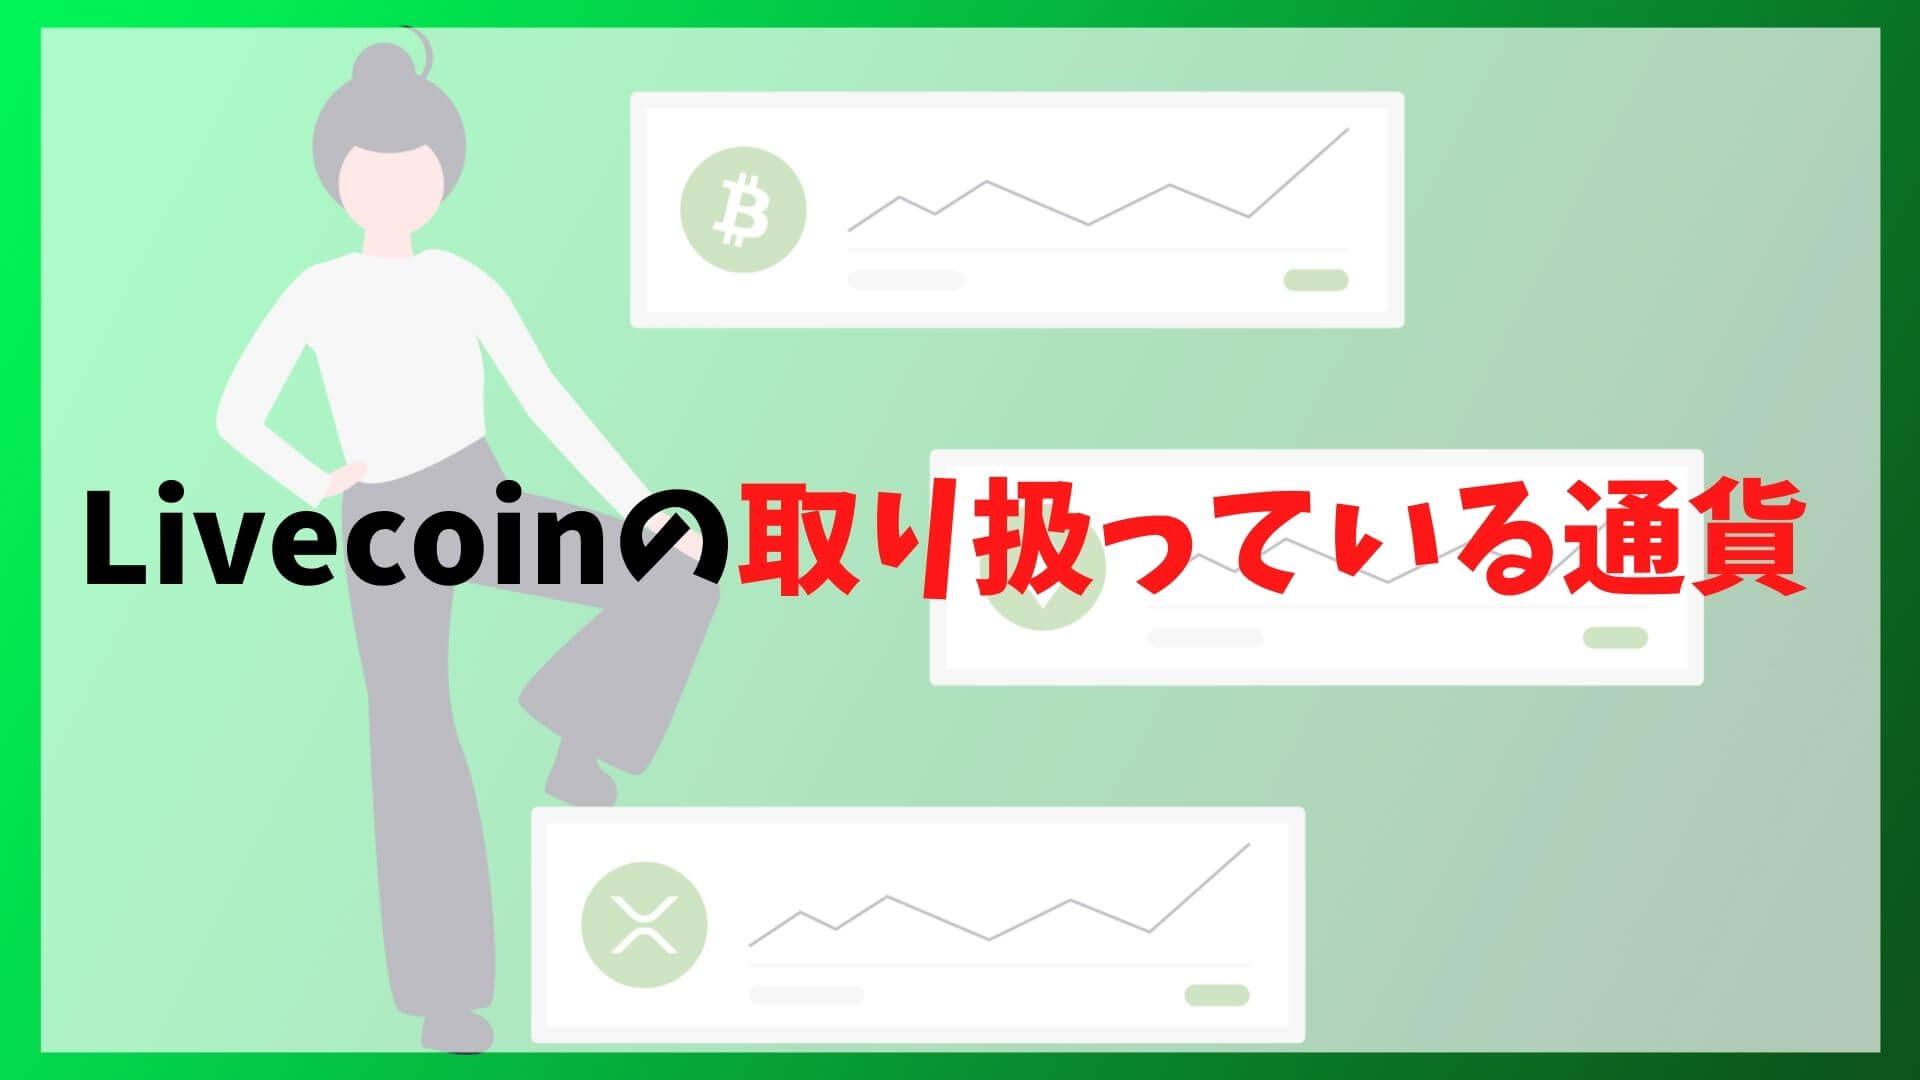 Livecoinの取扱通貨